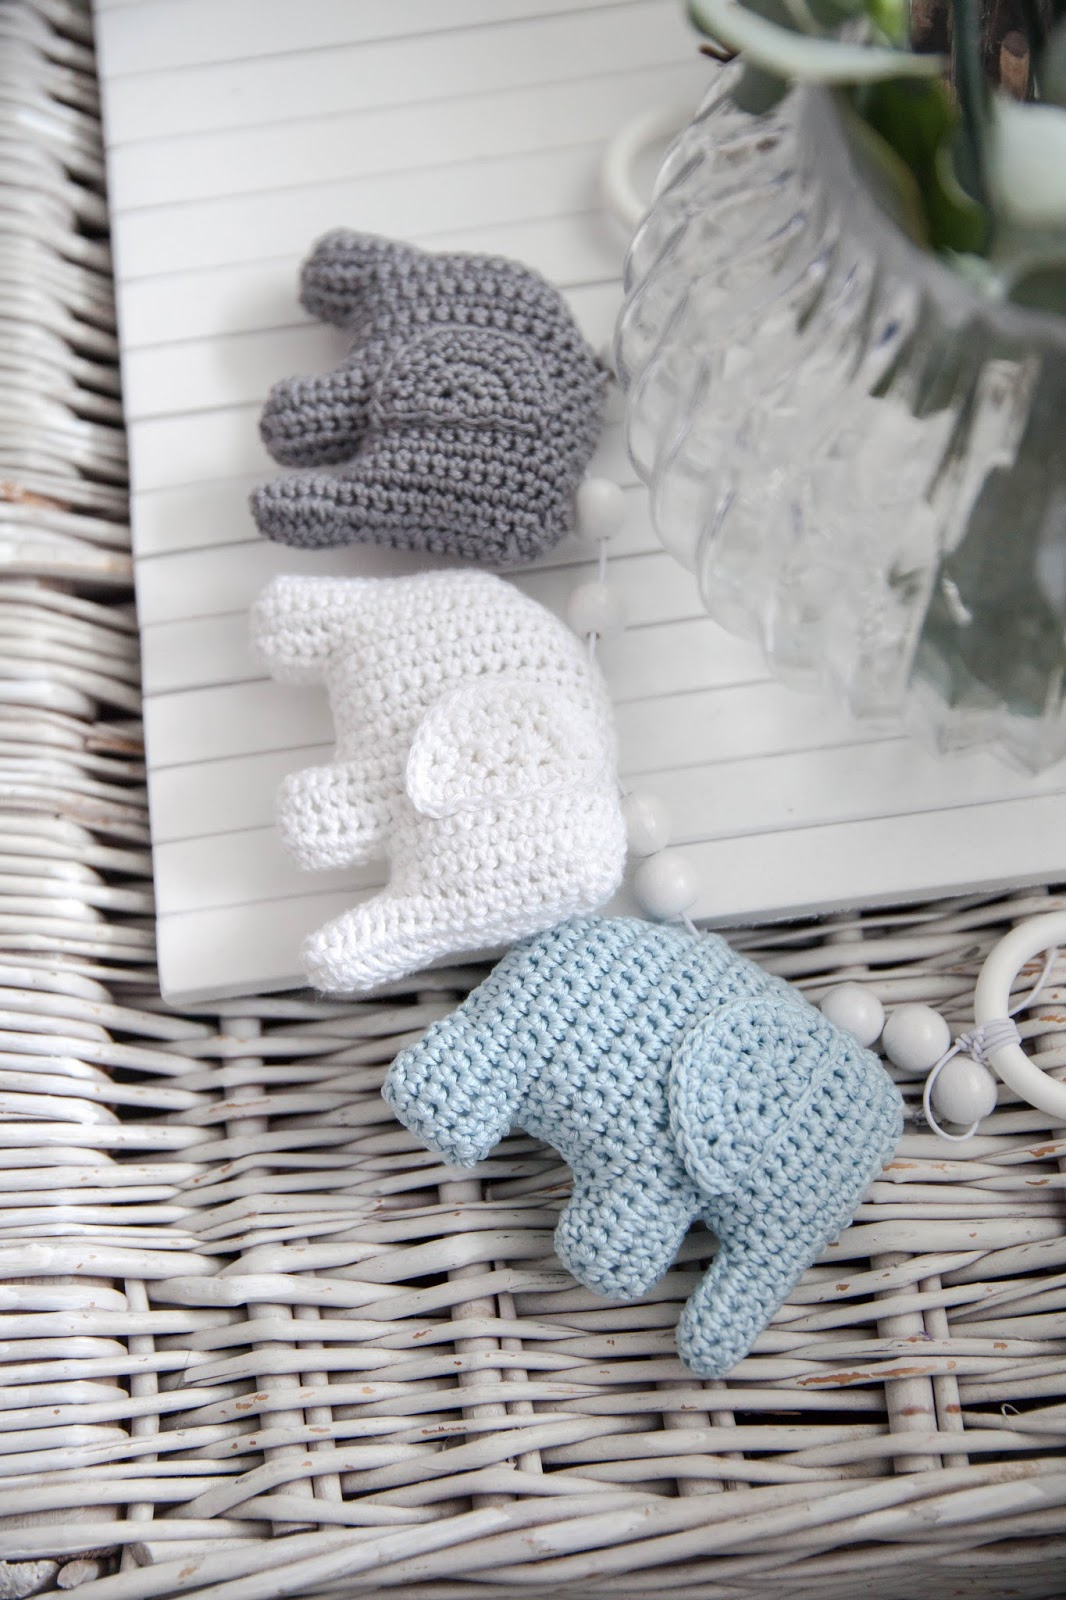 vaunulelu norsu vauvalle